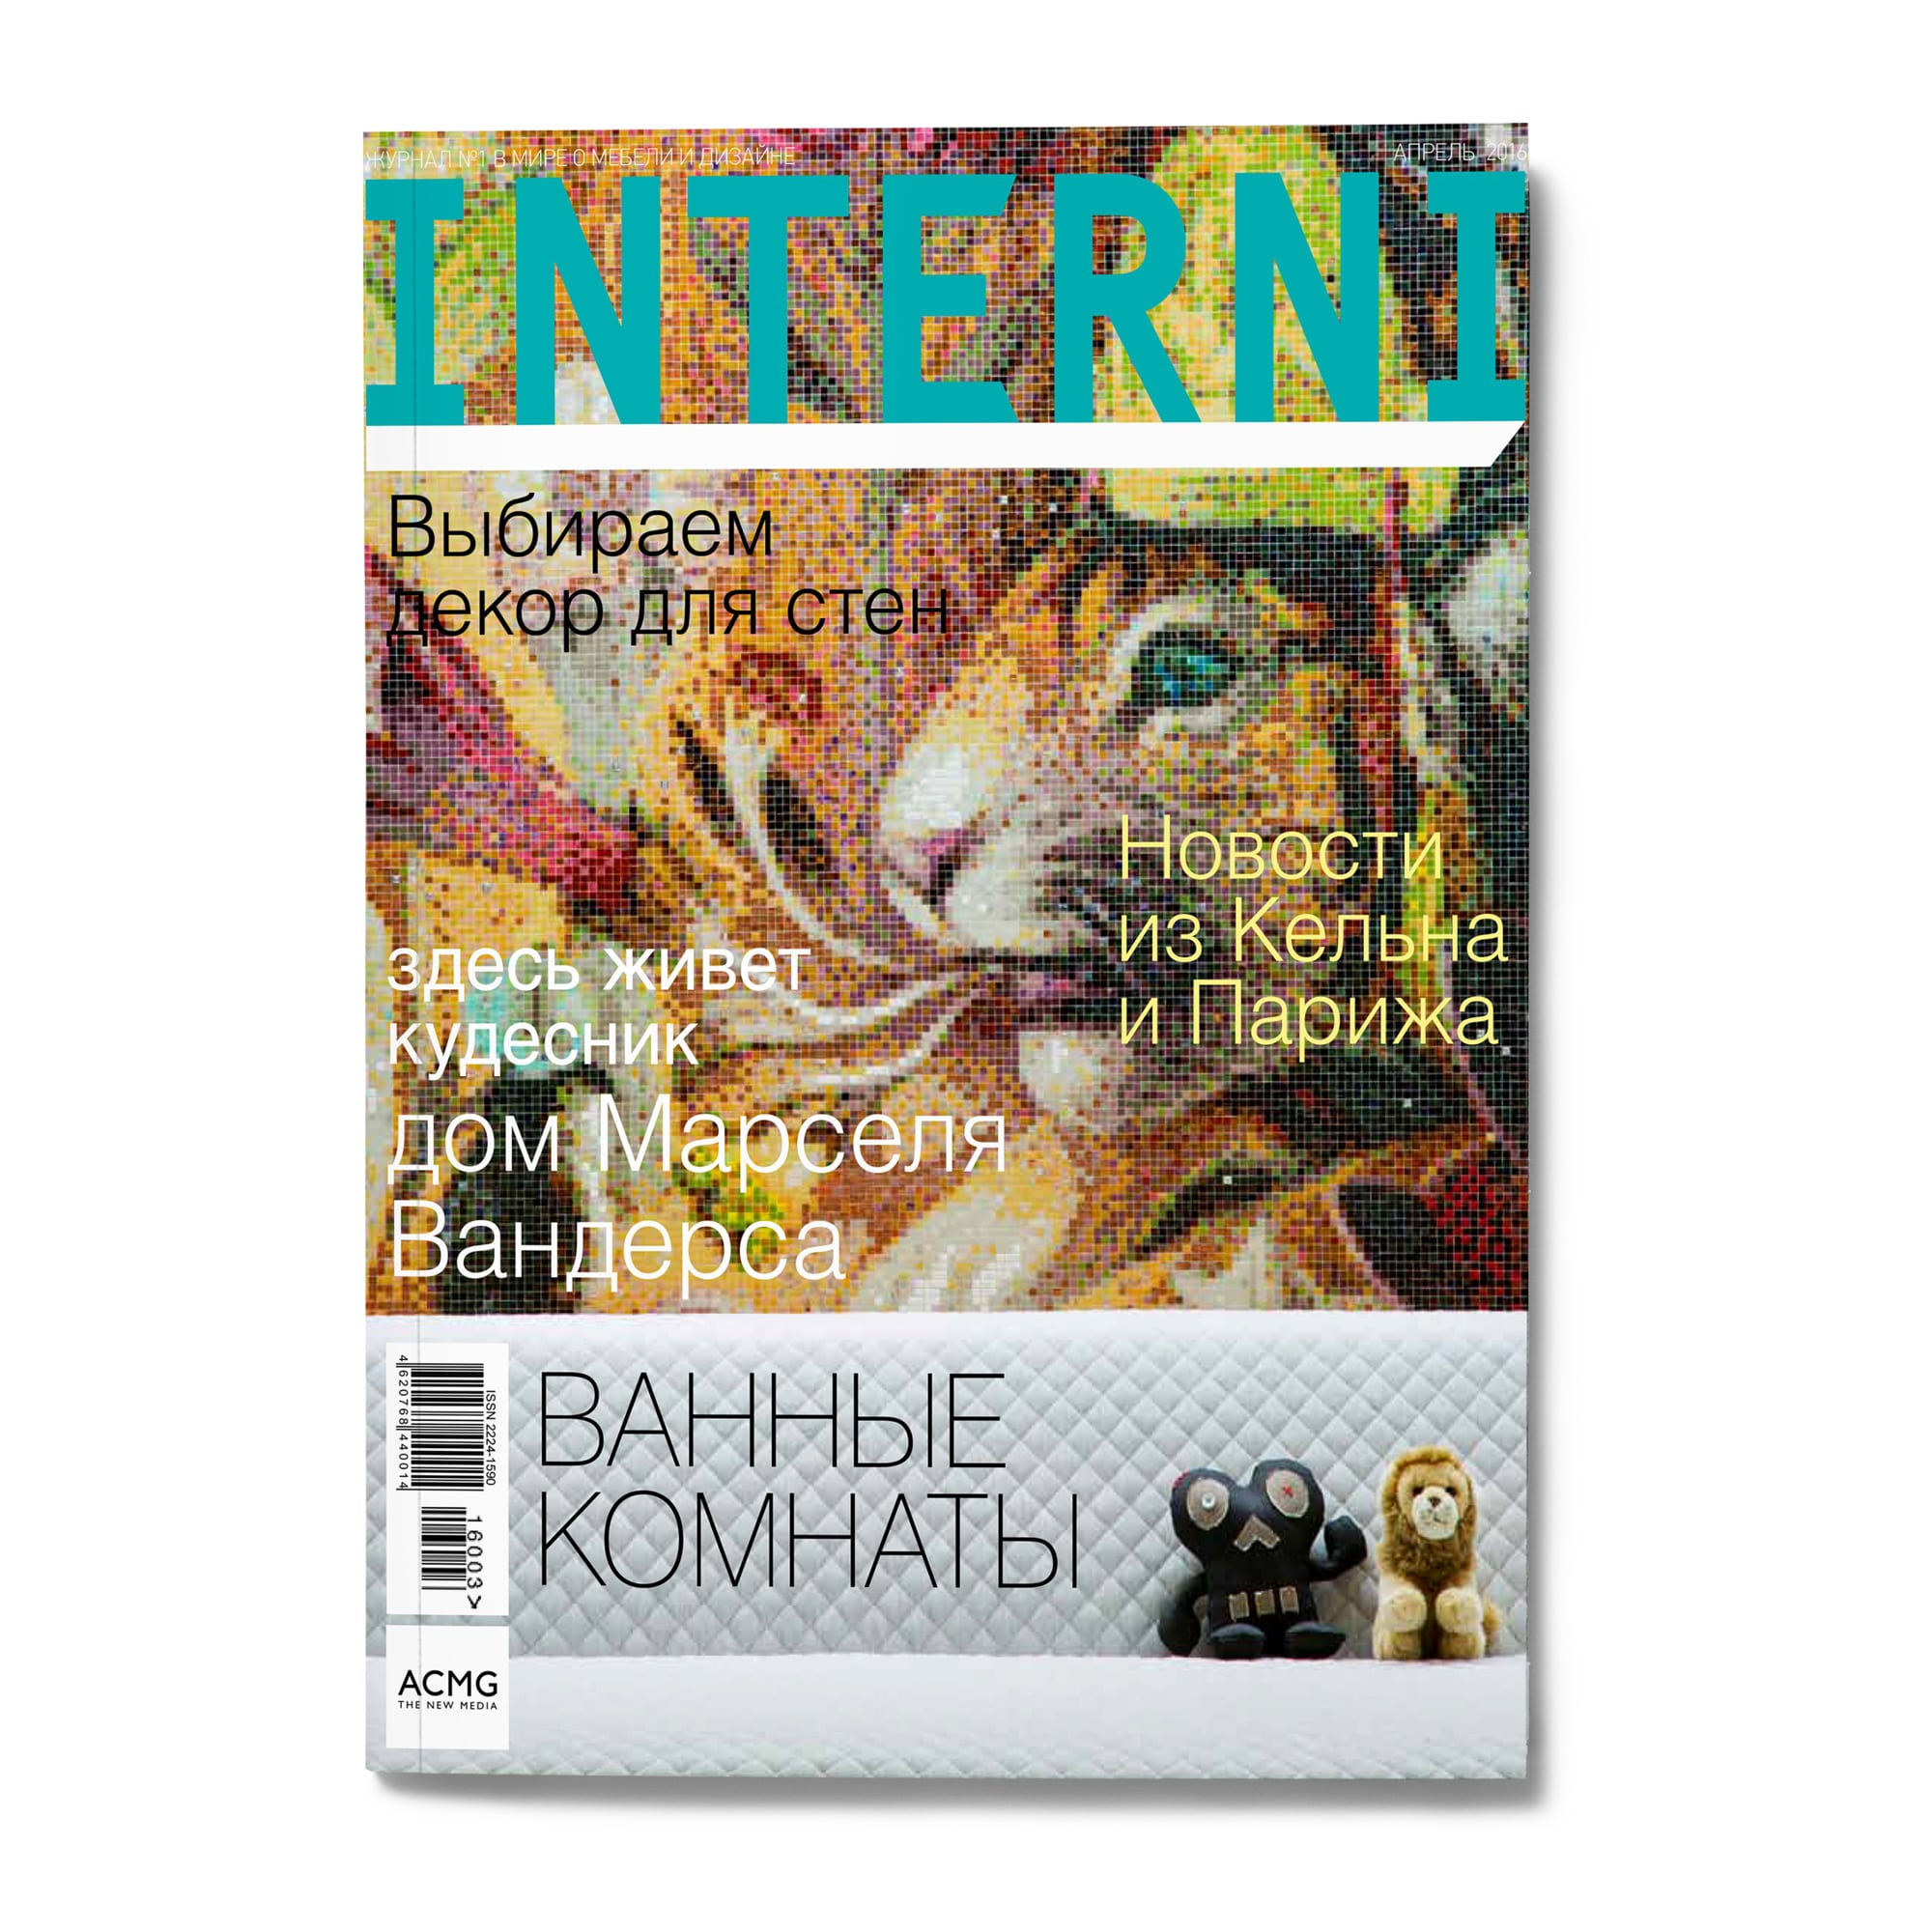 Interni Front Page